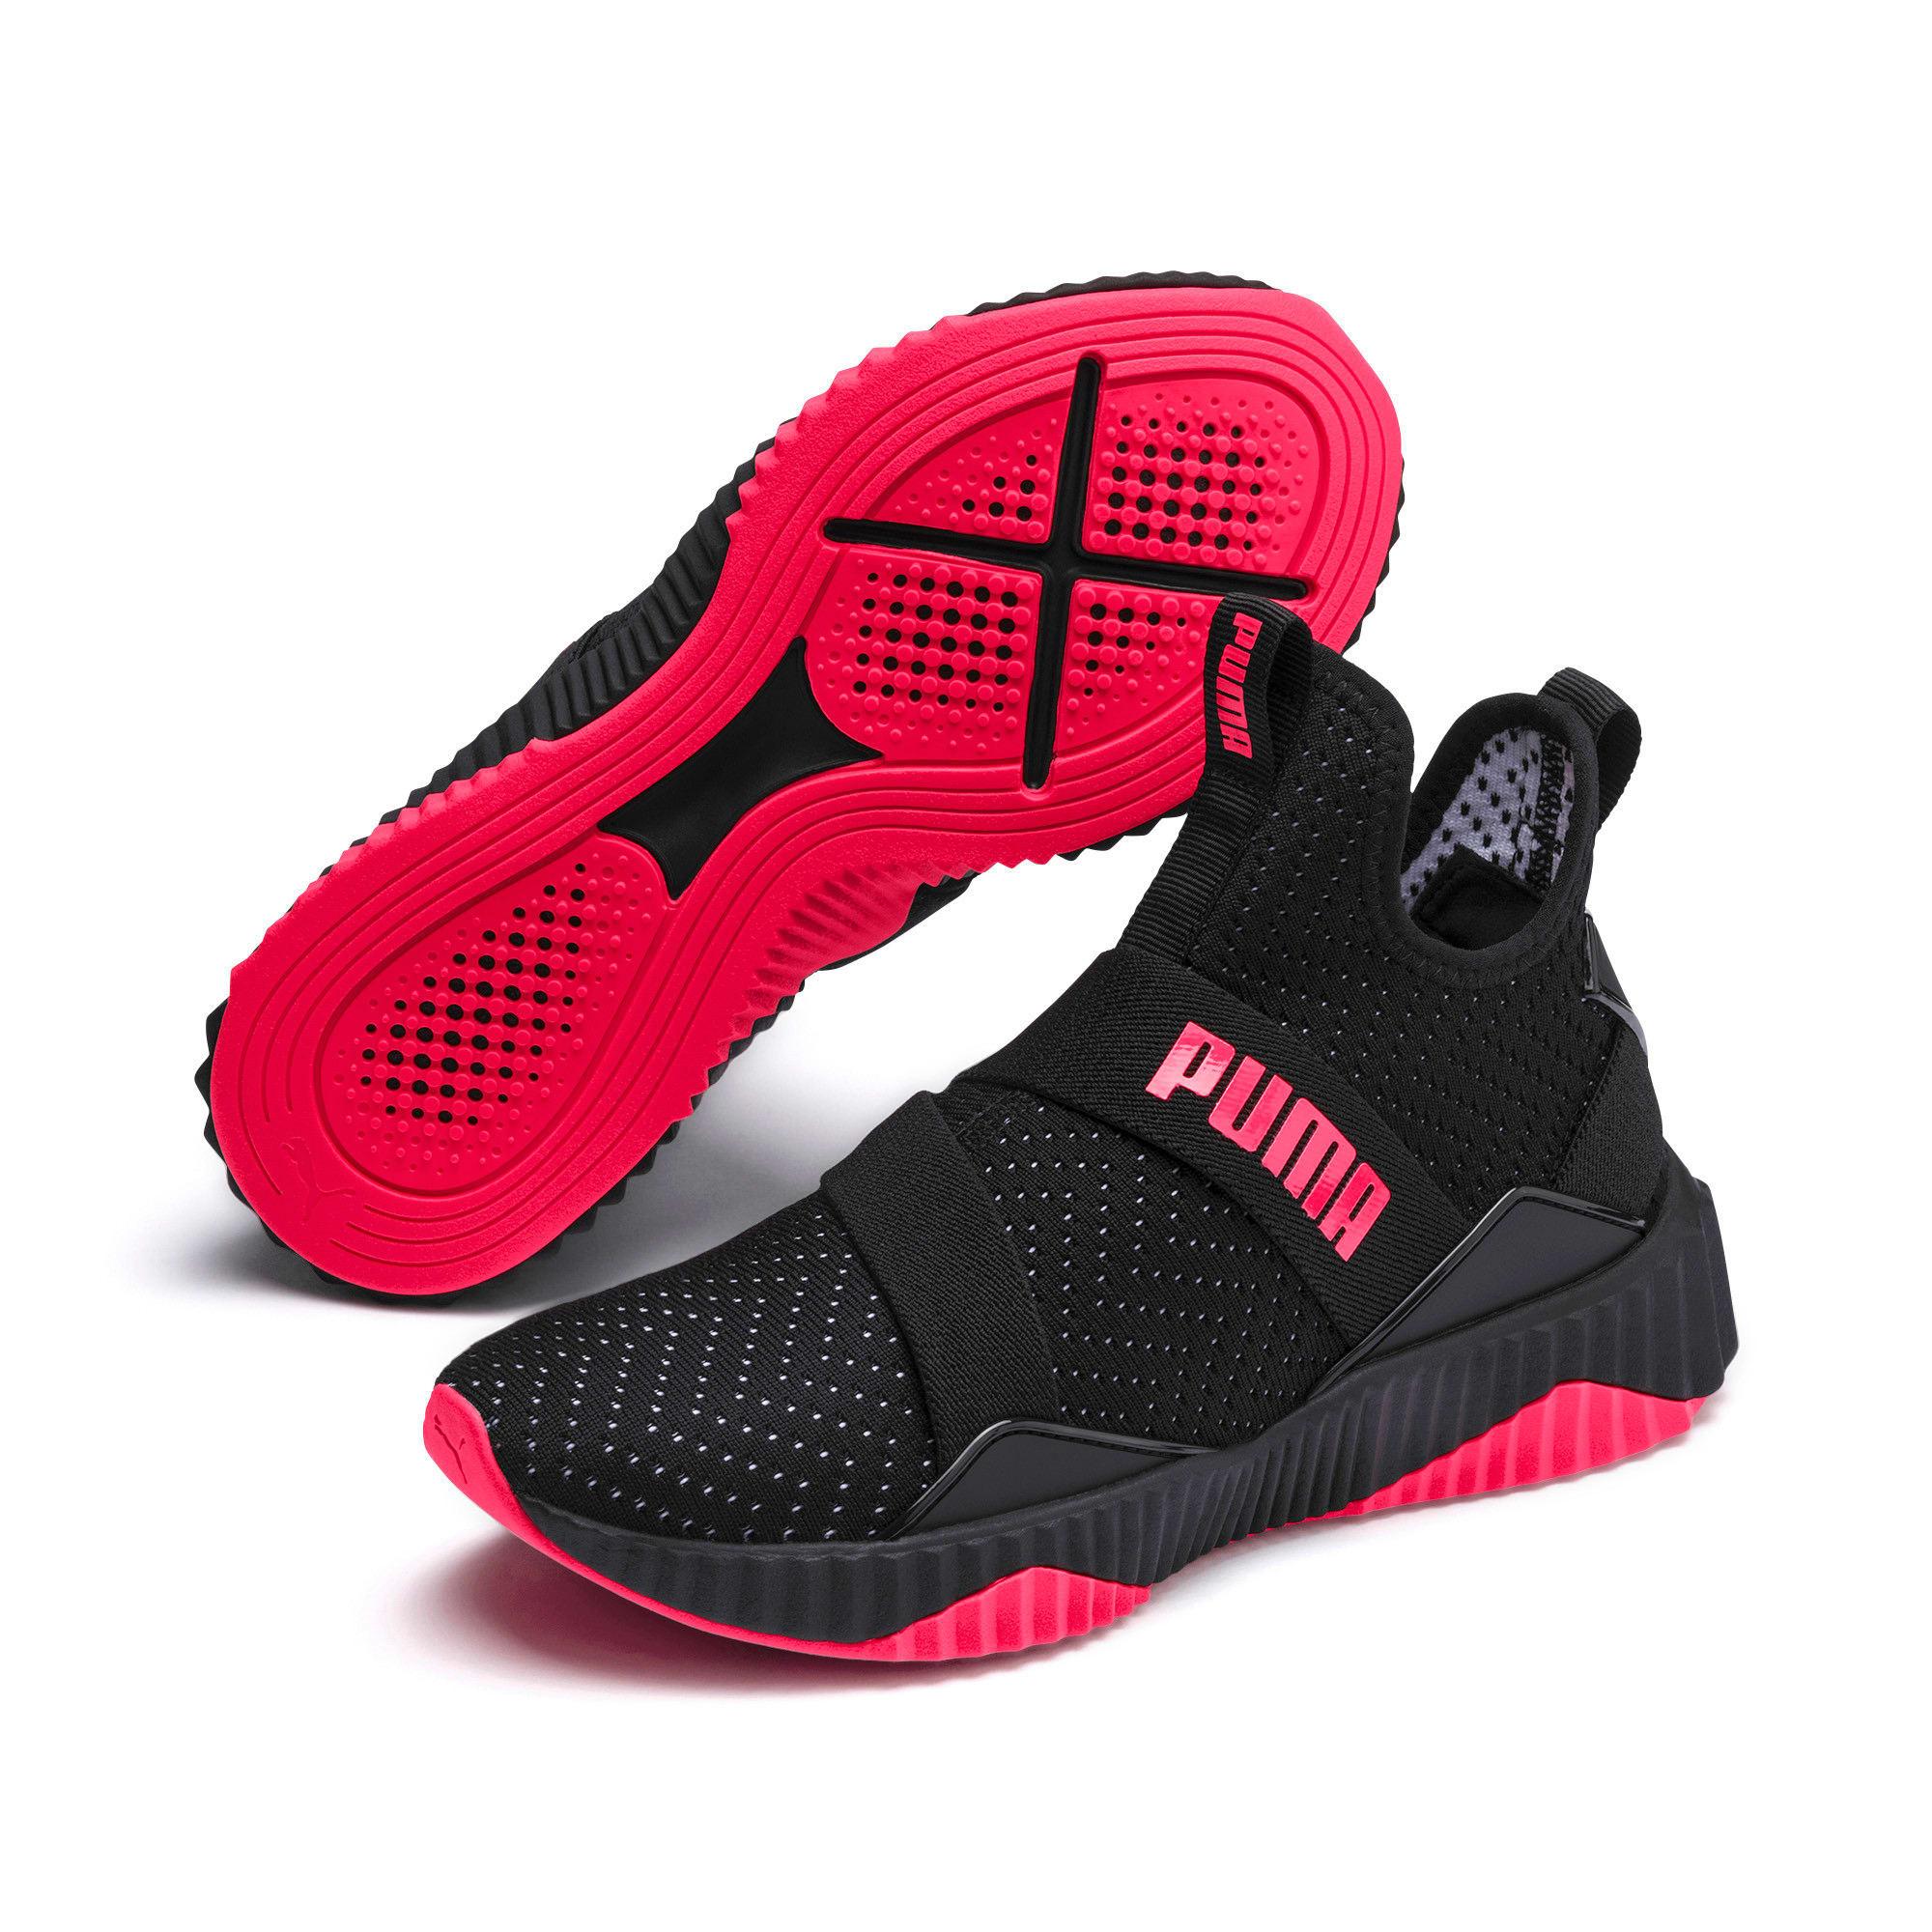 Thumbnail 3 of Defy Mid Core Women's Training Shoes, Puma Black-Pink Alert, medium